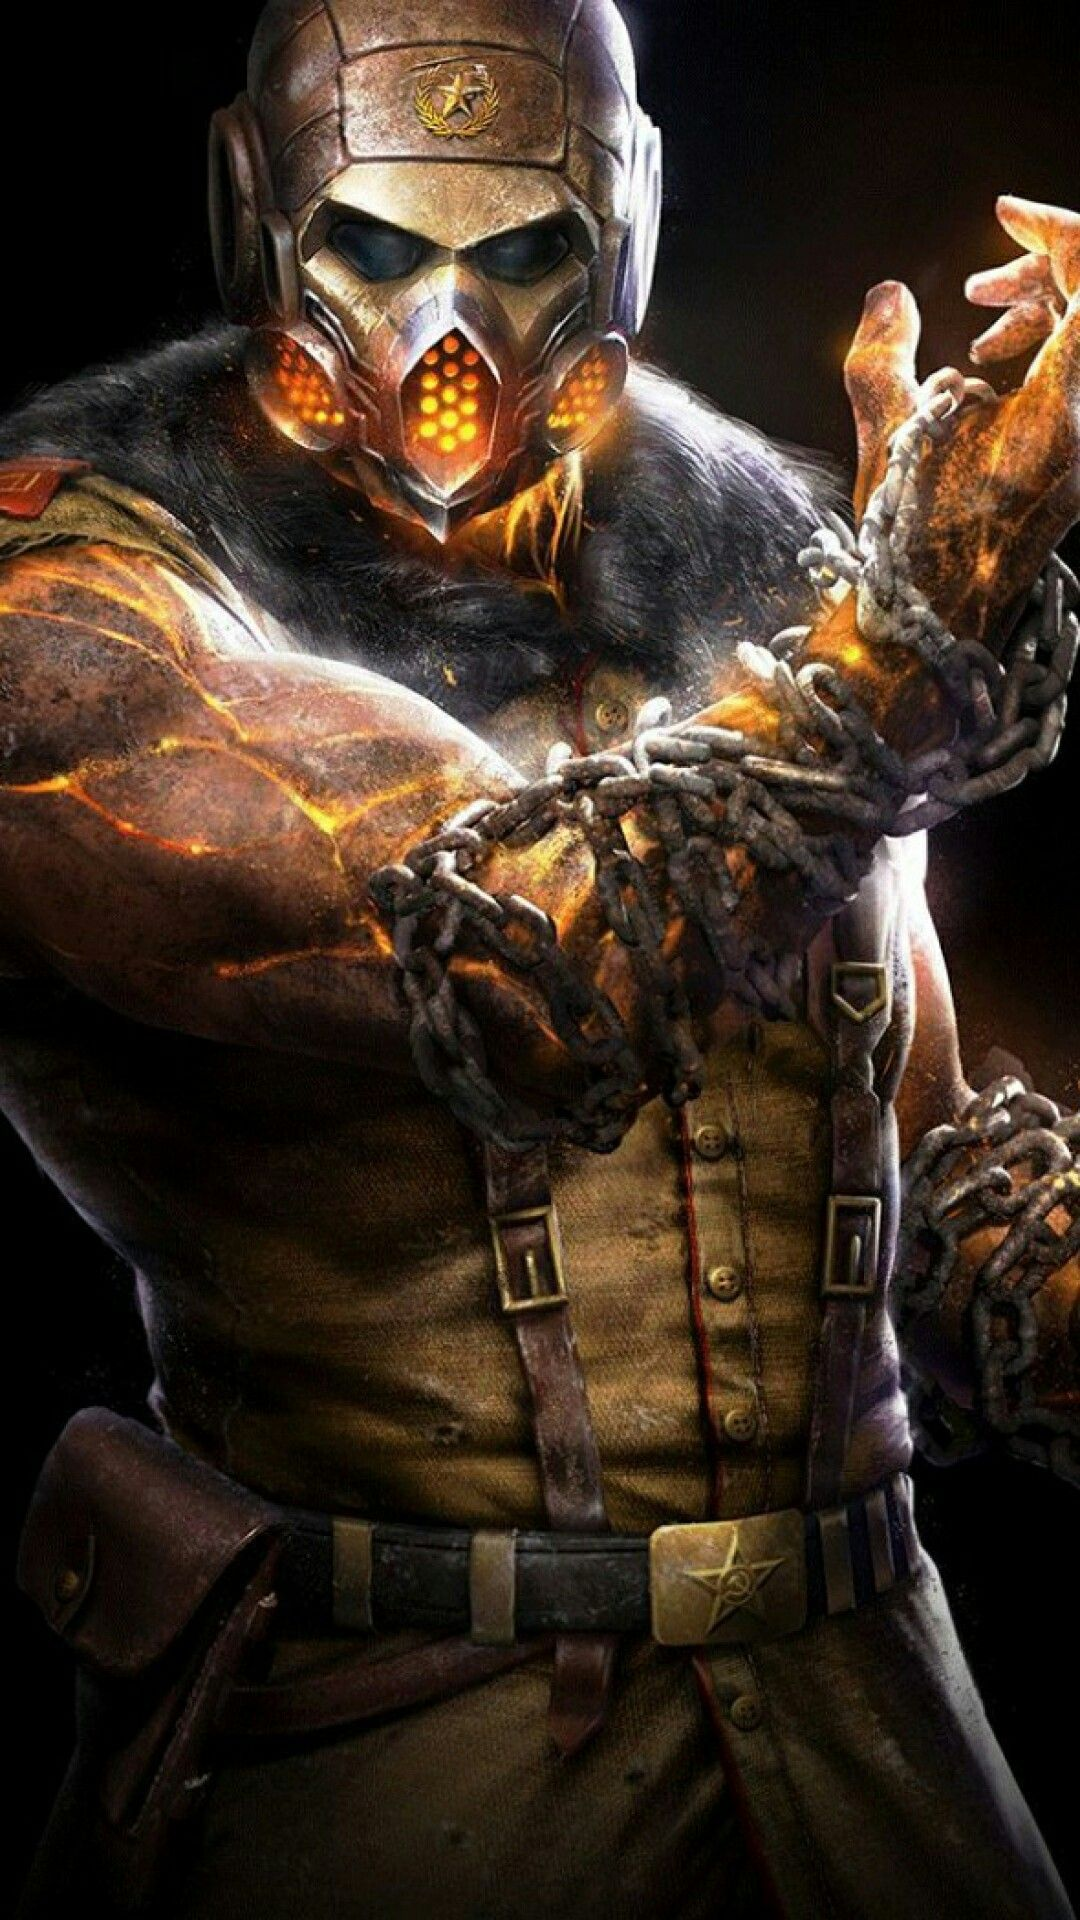 Scorpion Scorpion mortal kombat, Mortal kombat art